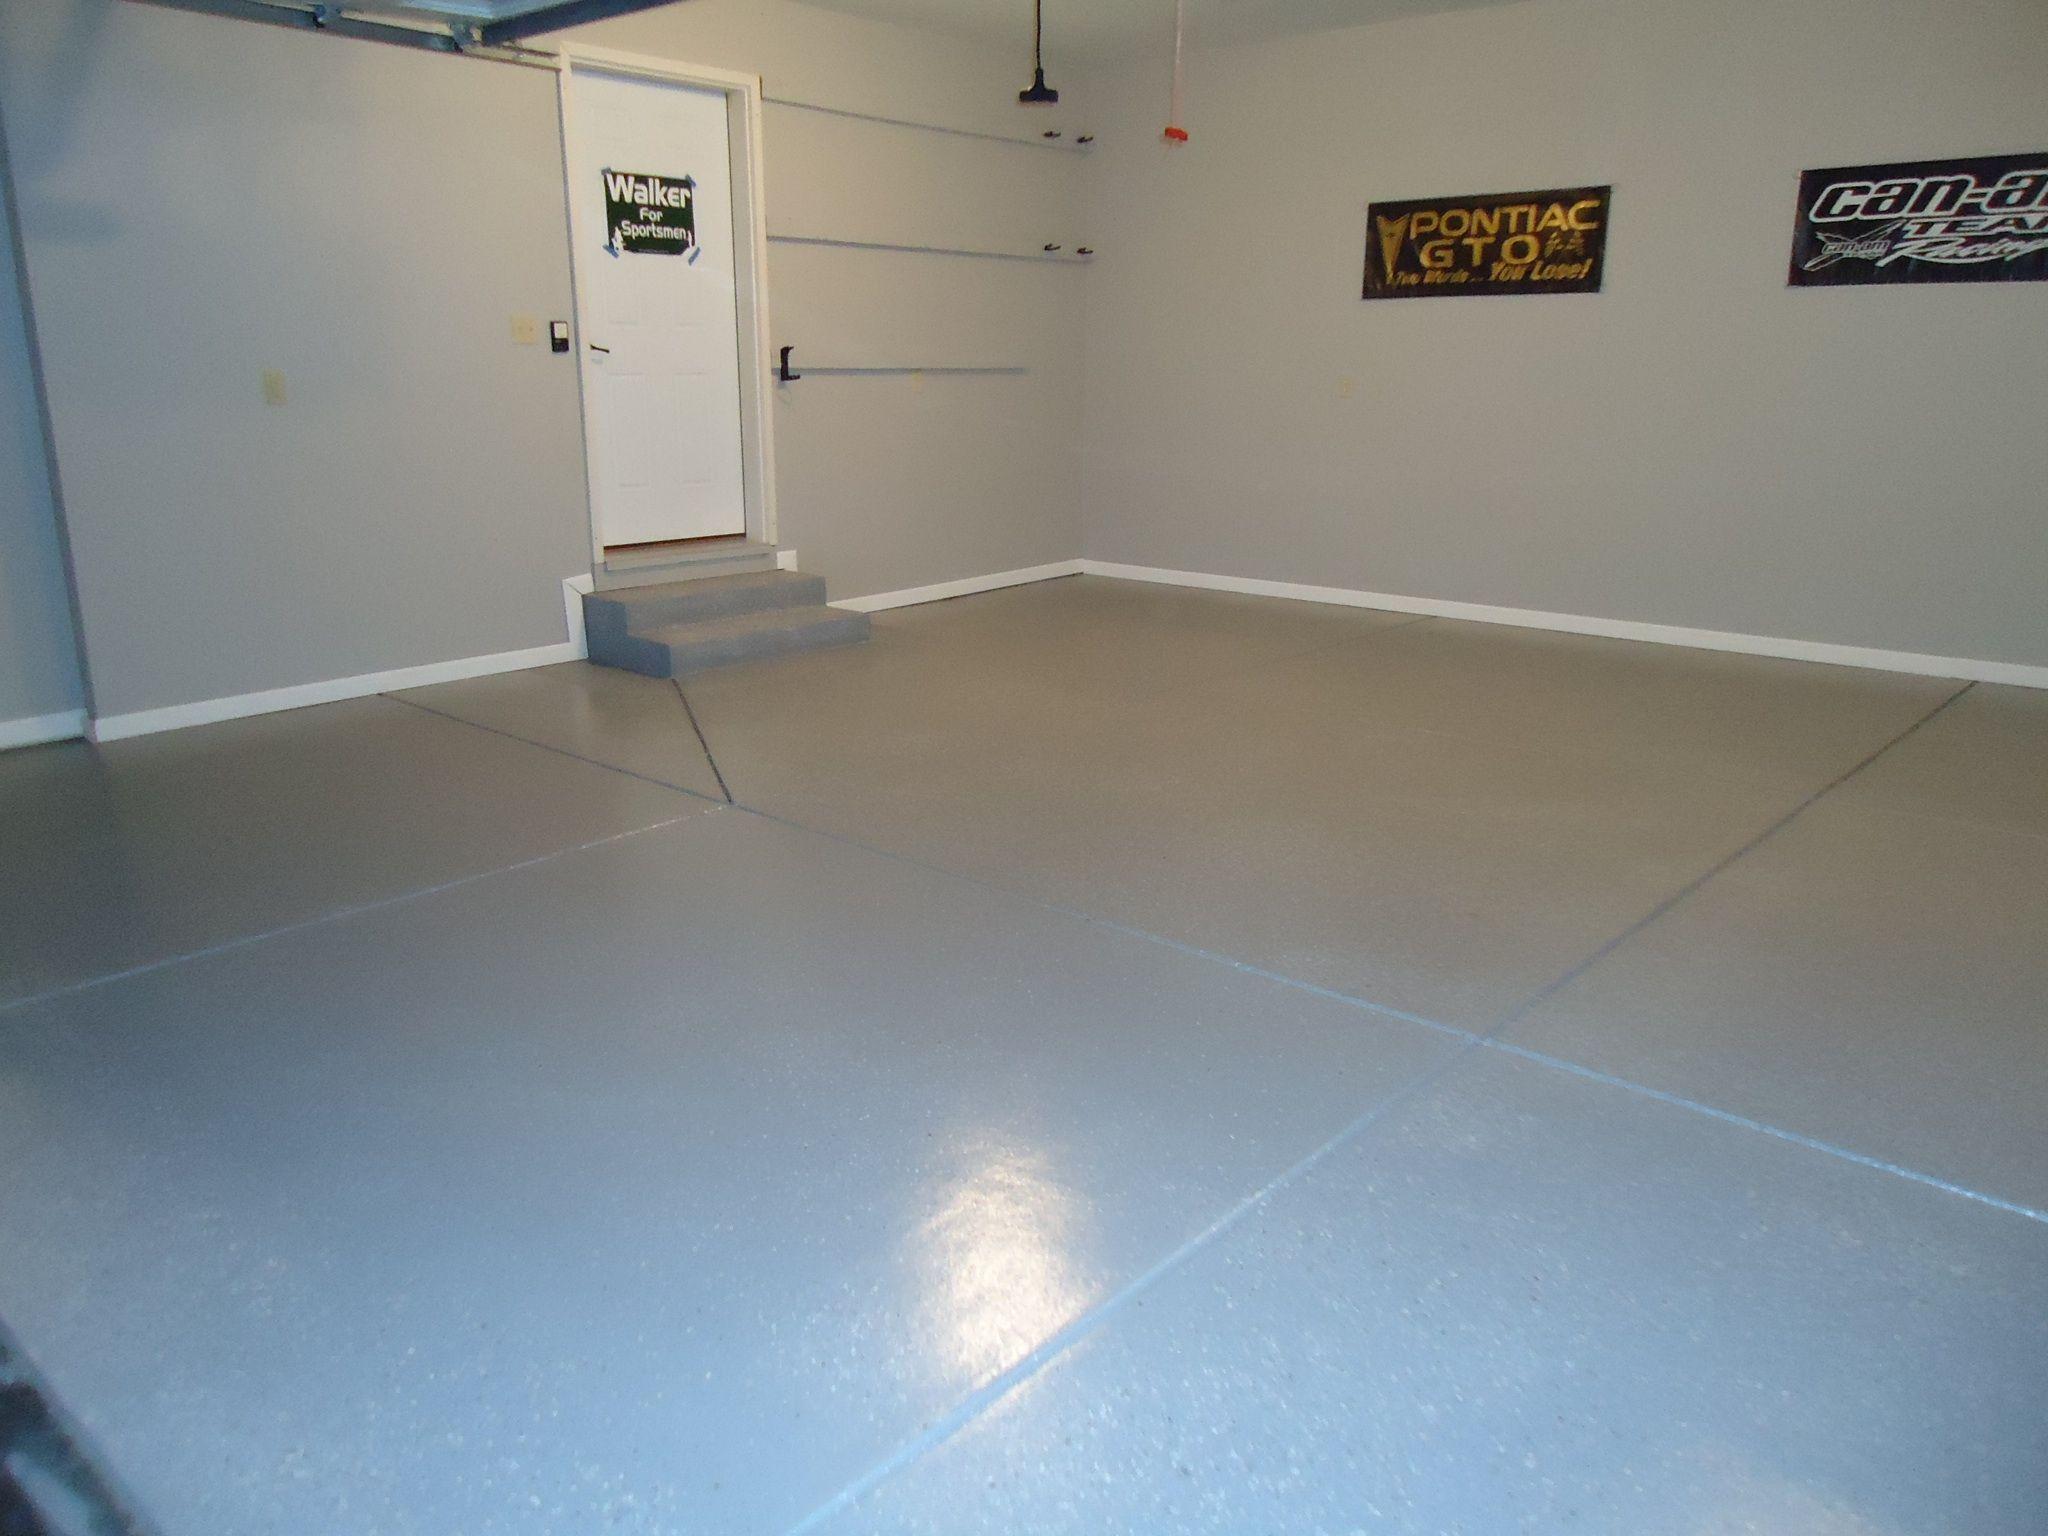 Epoxy Garage Floor Coating Painted Walls And Trim Painted Floor Coating Garage Floor Coatings Epoxy Garage Floor Coating